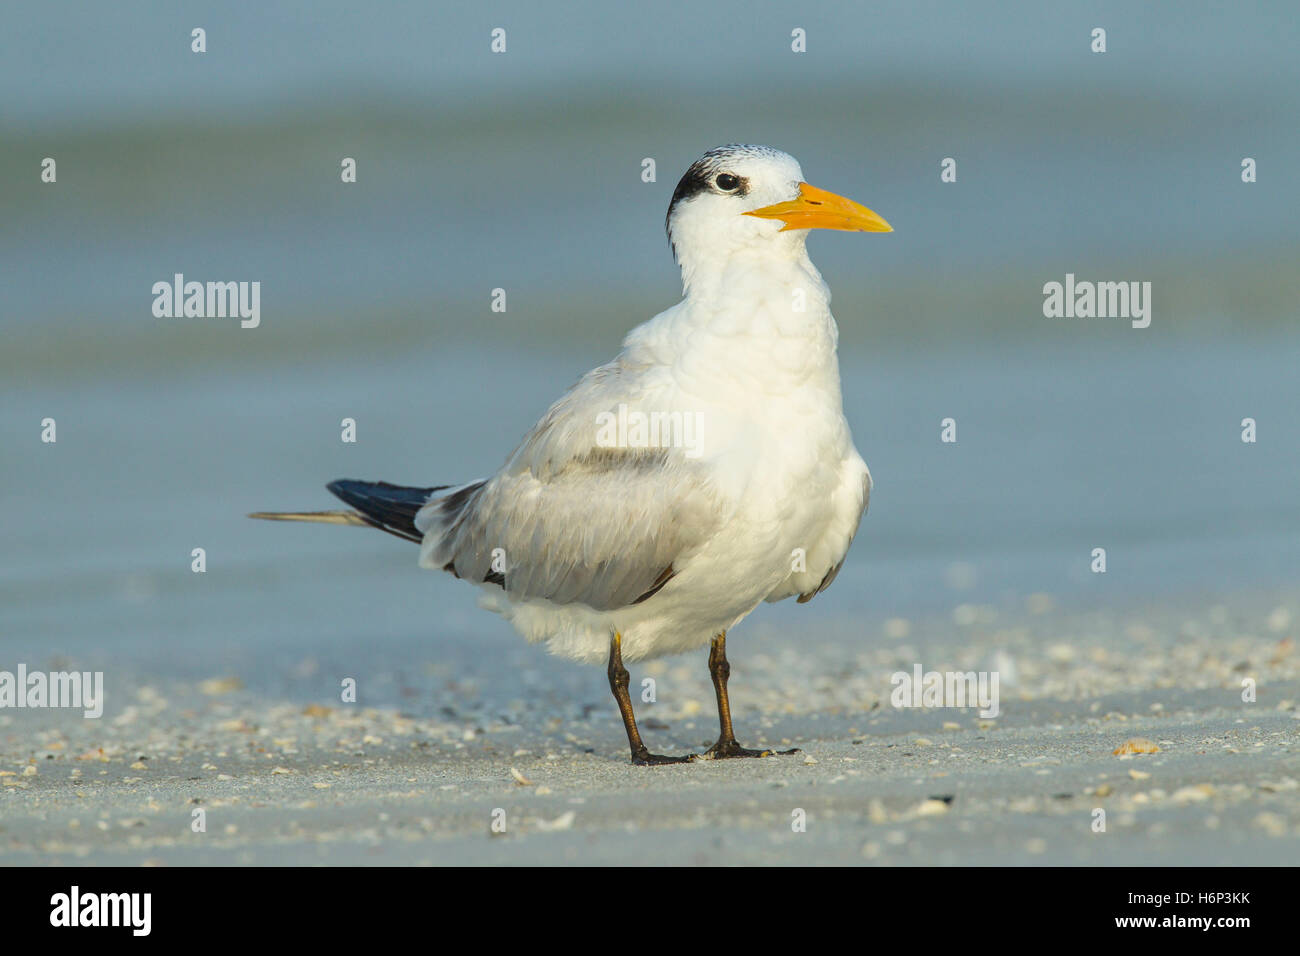 royal tern (Thalasseus maximus) adult resting on beach, Florida, USA - Stock Image